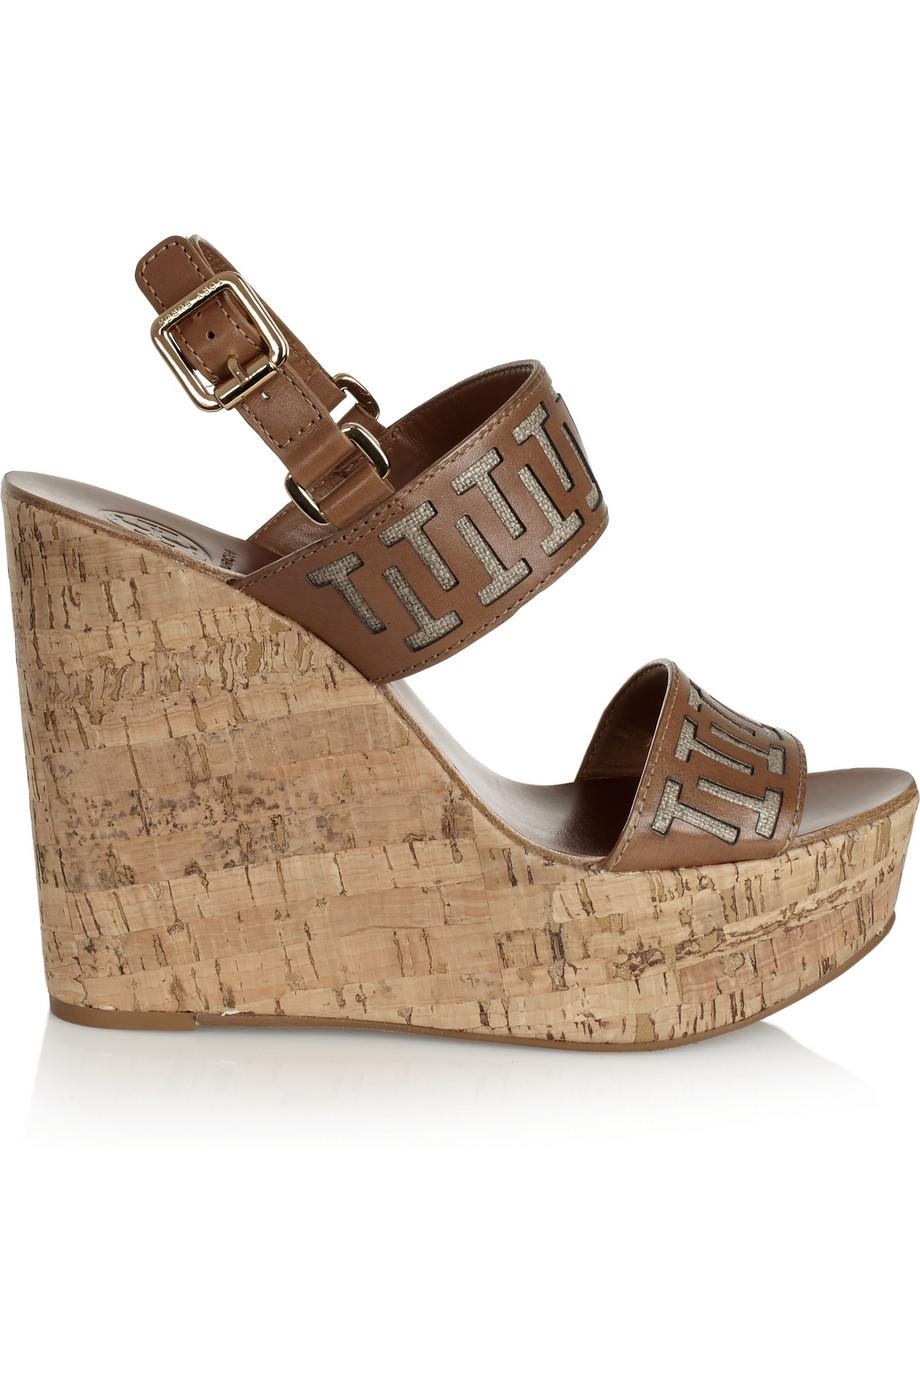 Tory Burch Regan Leather Wedge Sandals In Brown Lyst